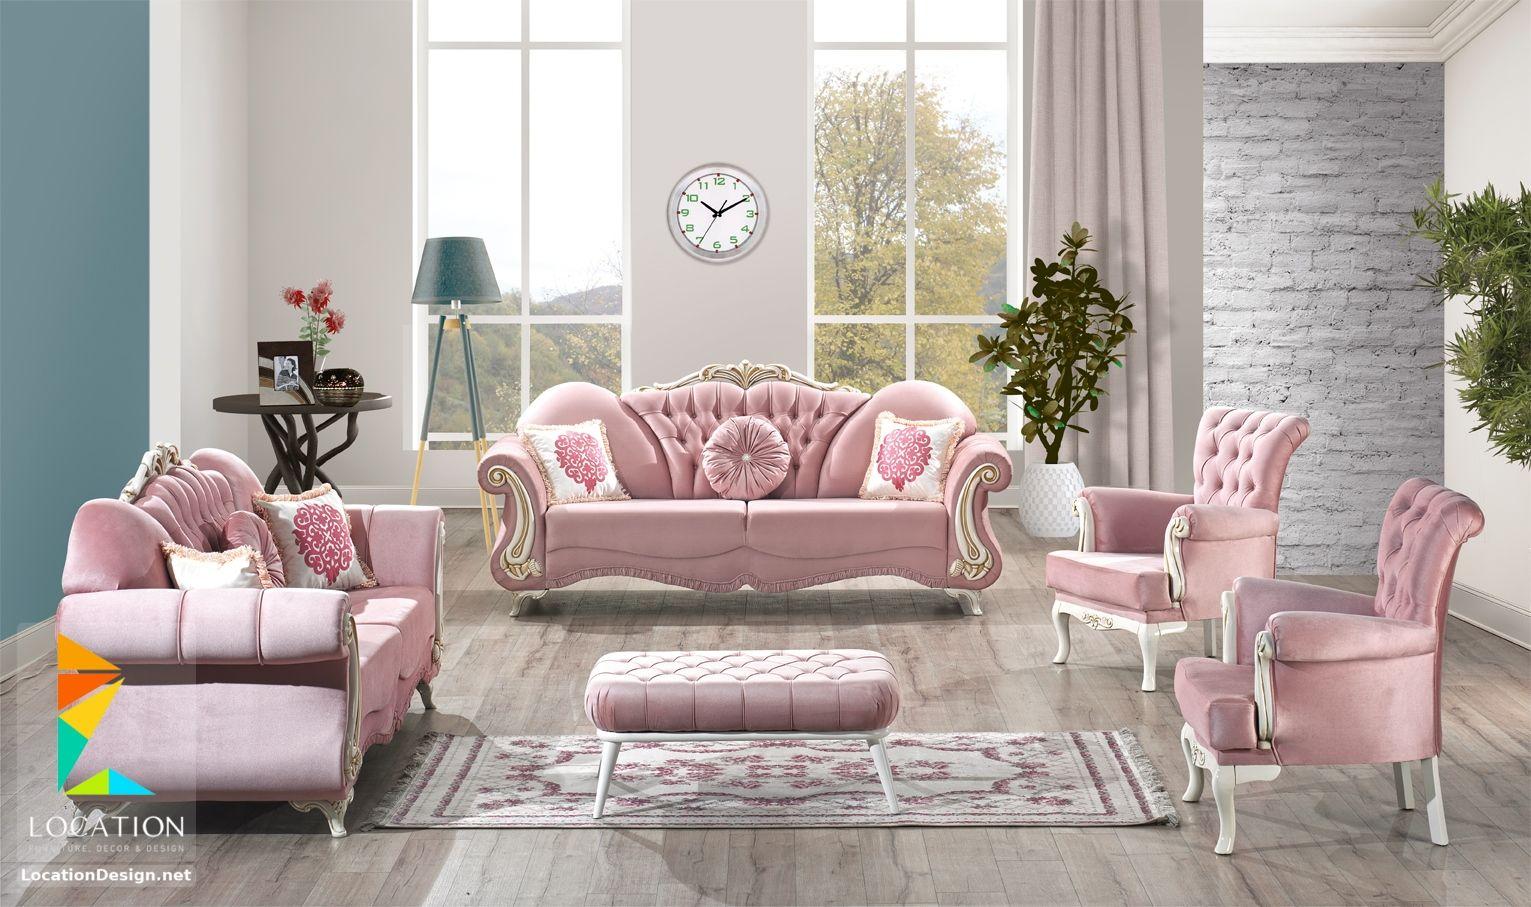 اجمل موديلات انتريهات مودرن من احدث كتالوج صور واشكال الانتريهات المودرن 2019 2020 Room Interior Design Home Design Decor Turkish Furniture